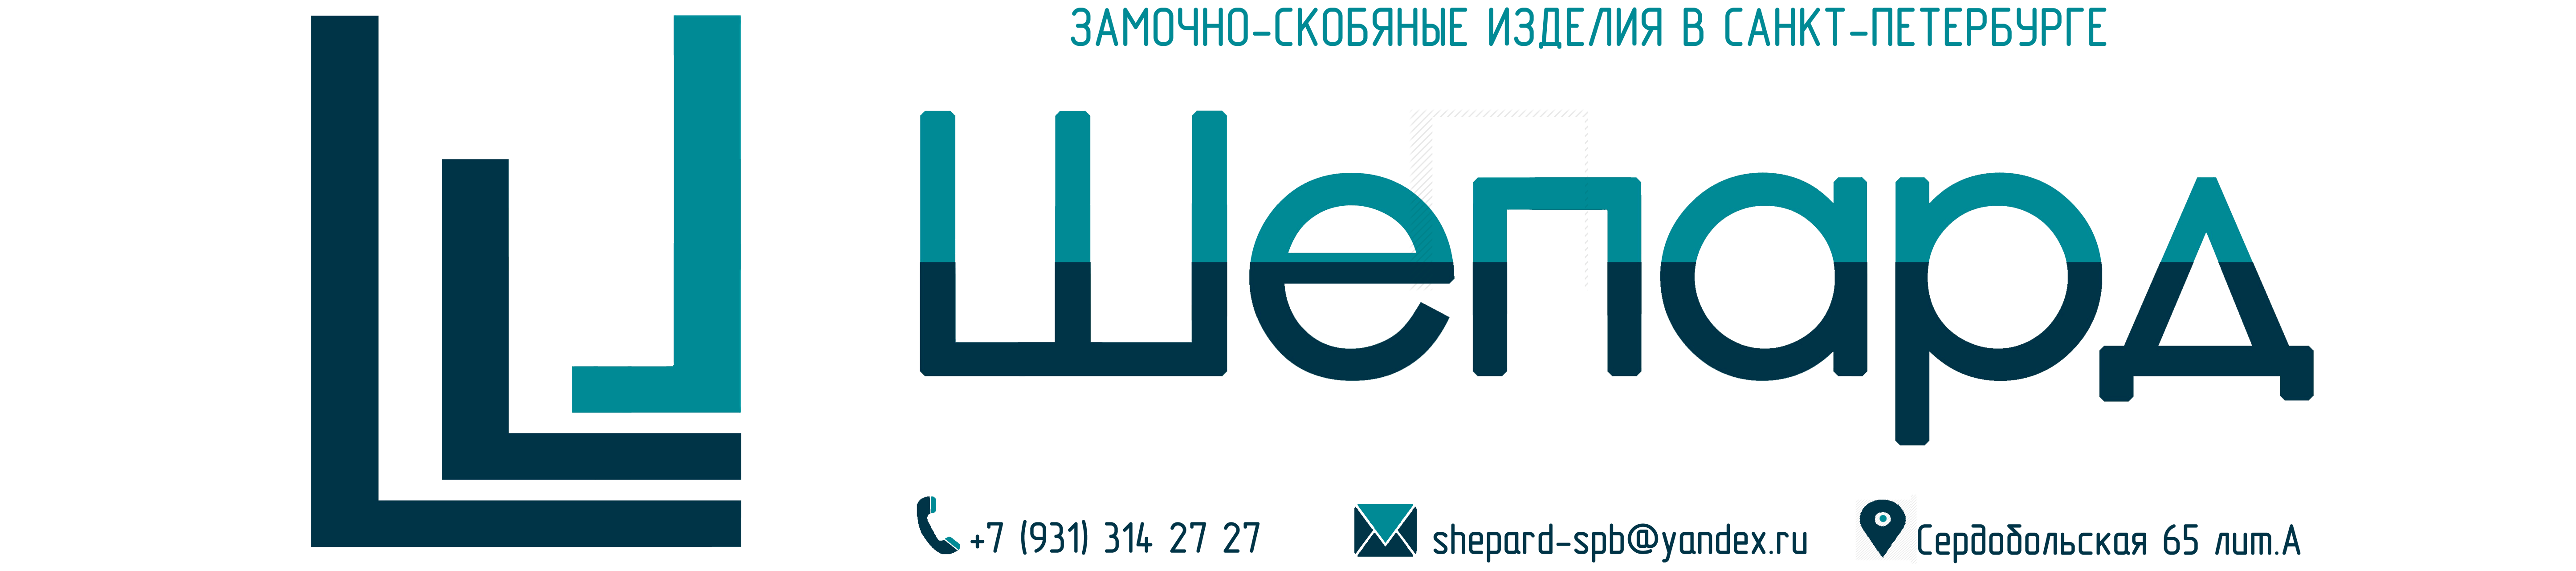 Шепард, С.Петербург